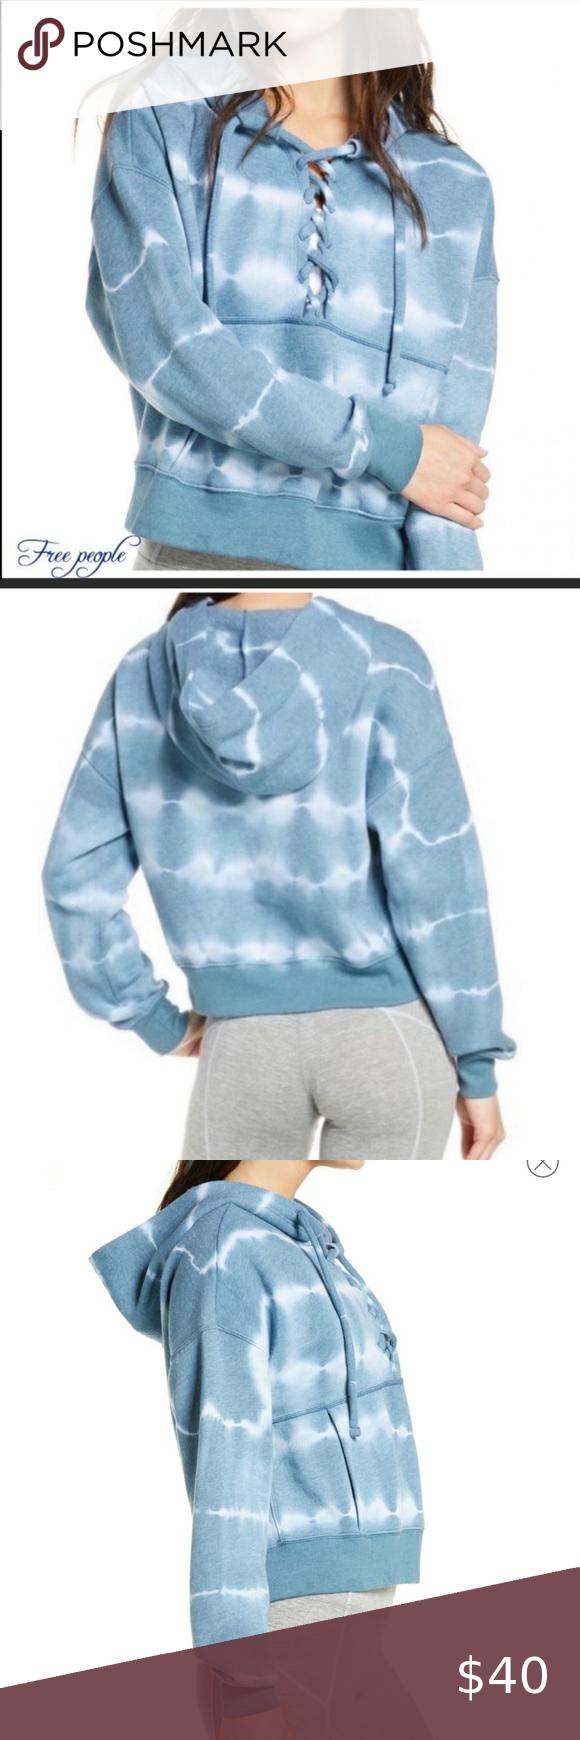 Sale Nwt Tie Dye Lace Up Hoodie Free People Zebra Print Leggings Fashion Clothes Design [ 1740 x 580 Pixel ]